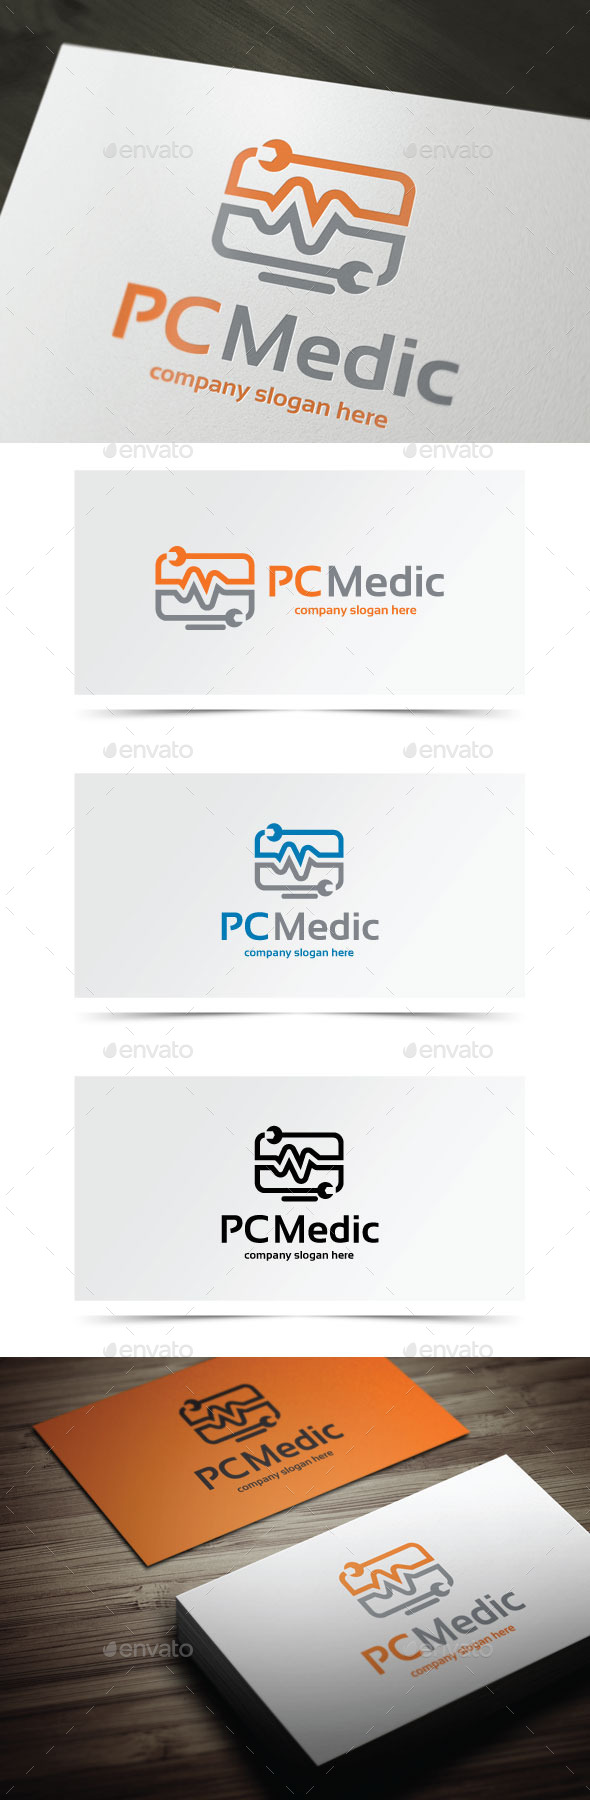 PC Medic - Objects Logo Templates